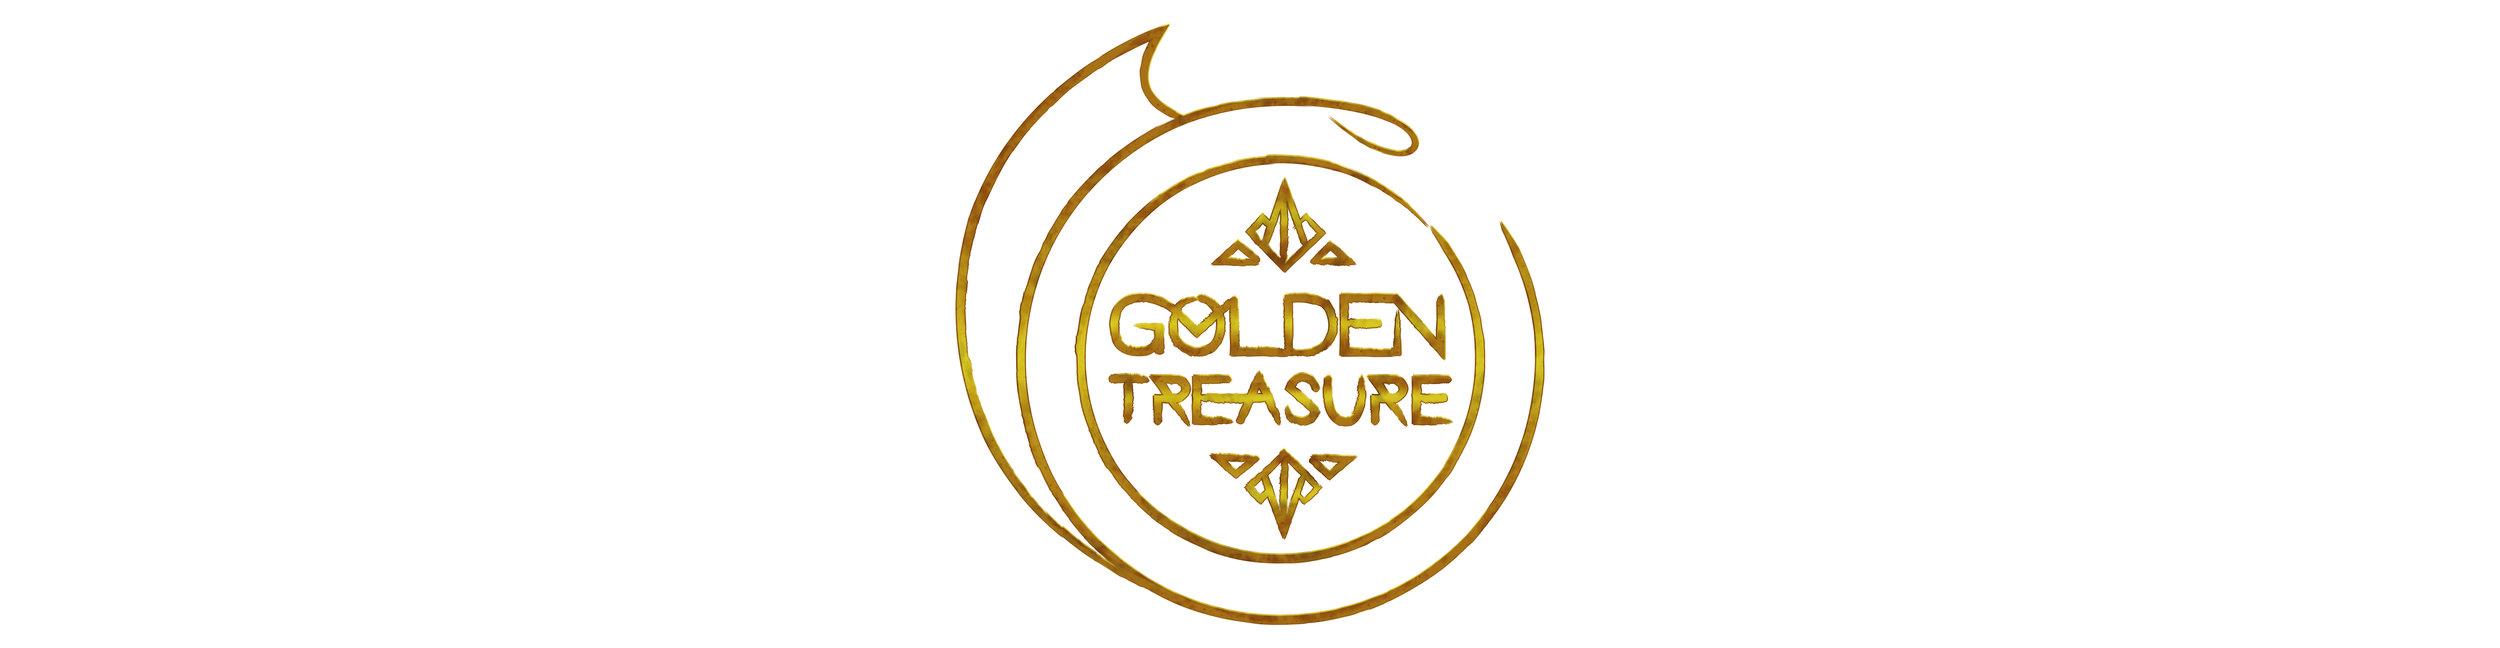 goldentreasurelogo1.jpg